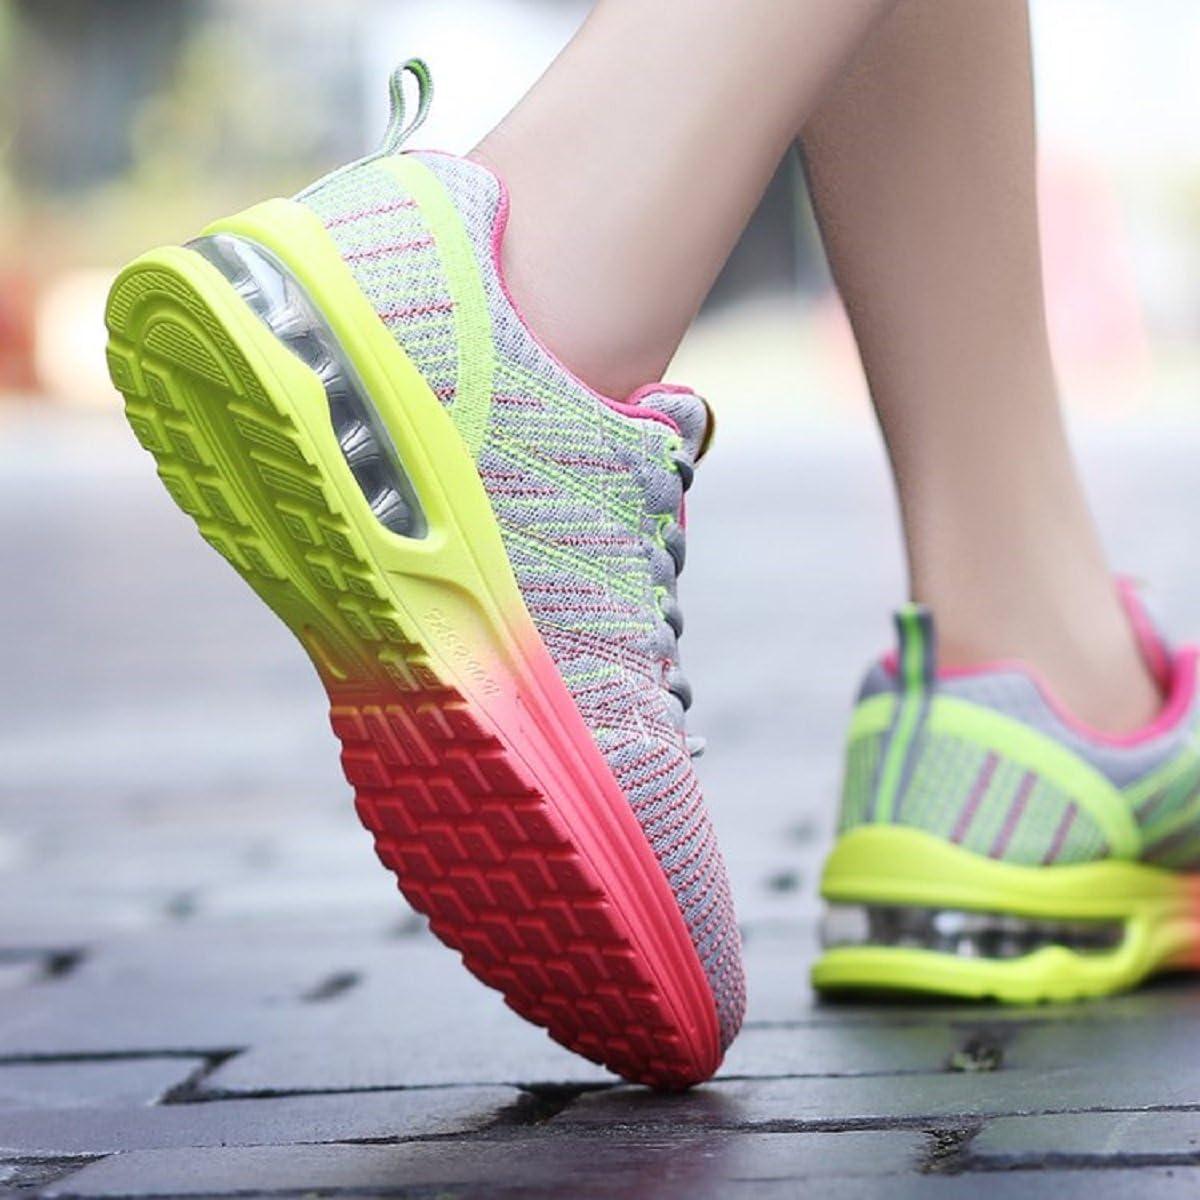 Homme Femme Chaussures de Running Sport Basket Respirante Travail Trail Sneakers Noir Rose Gris 35-46